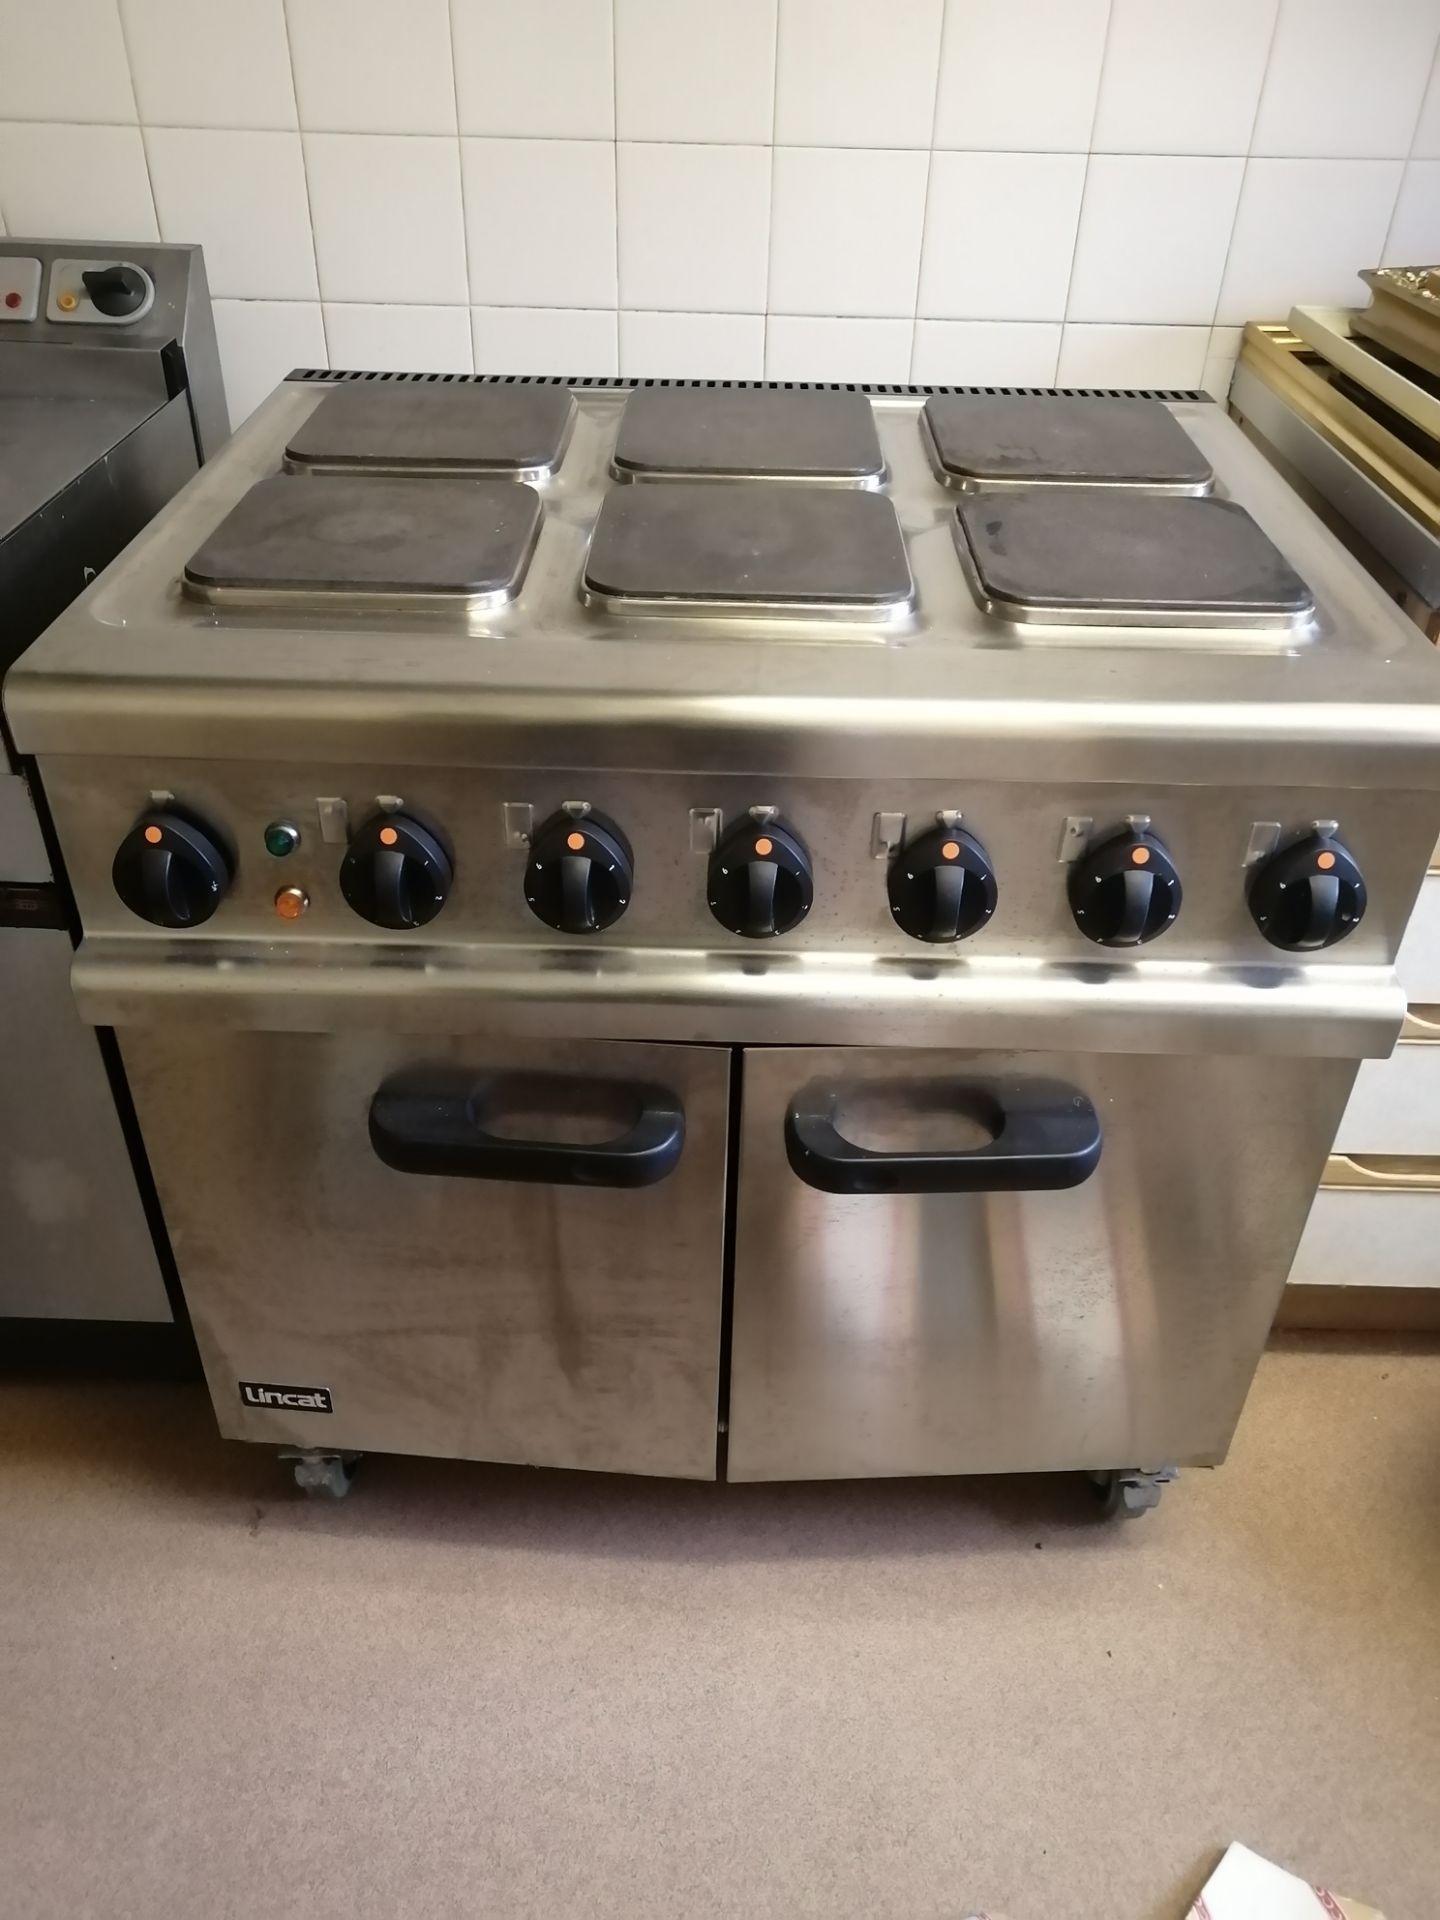 Lot 115 - Lincat Opus 700 Electric 6 Burner Oven